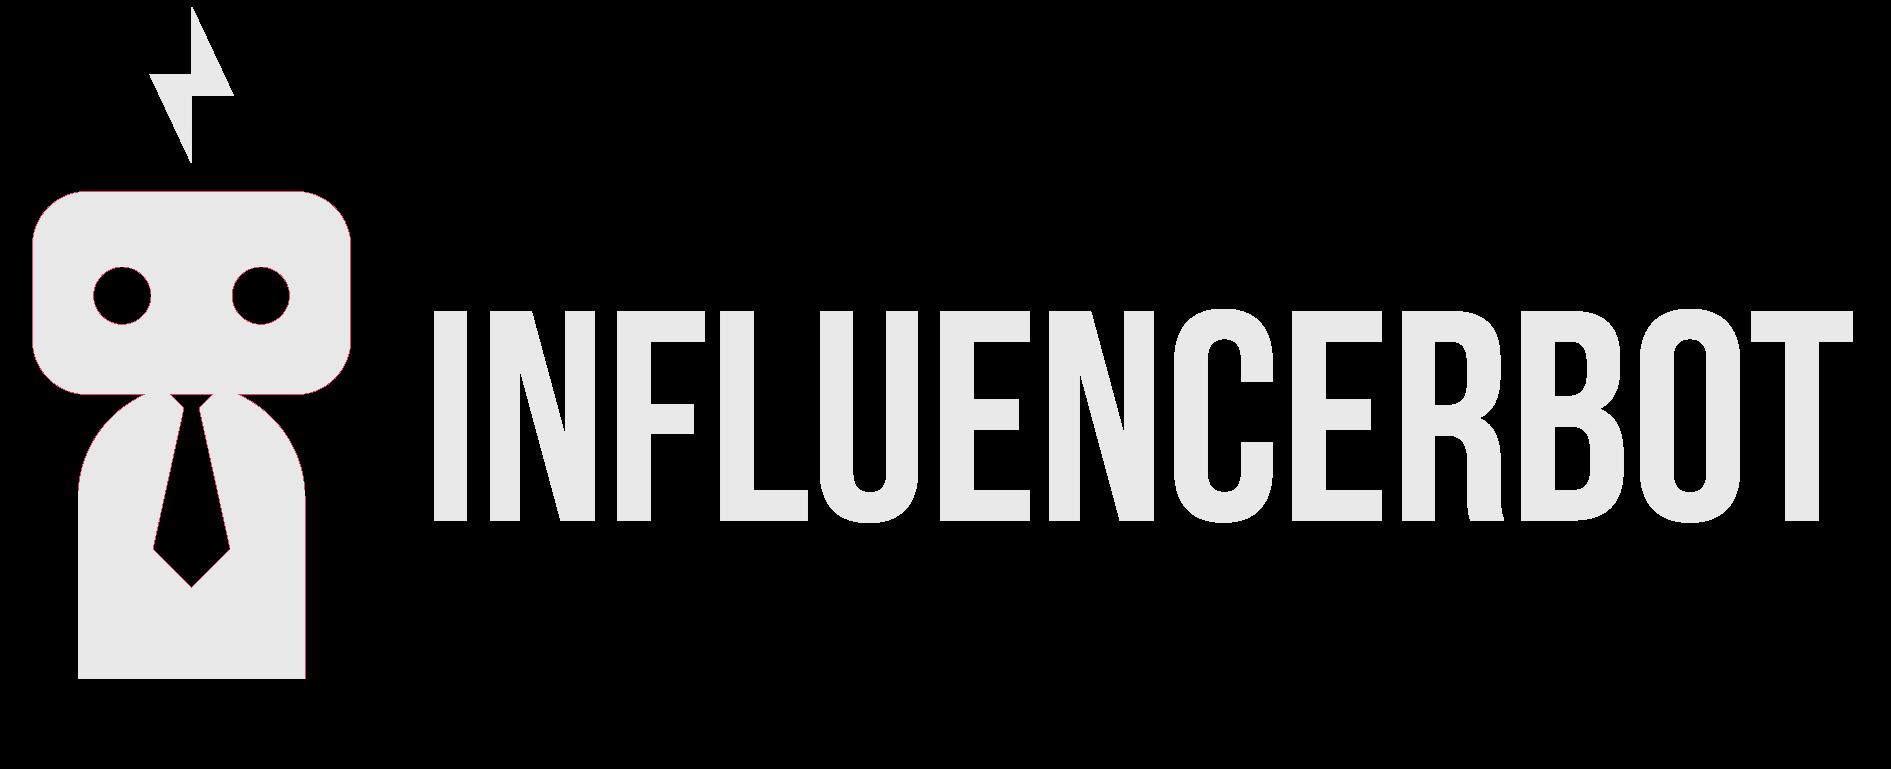 InfluencerBot